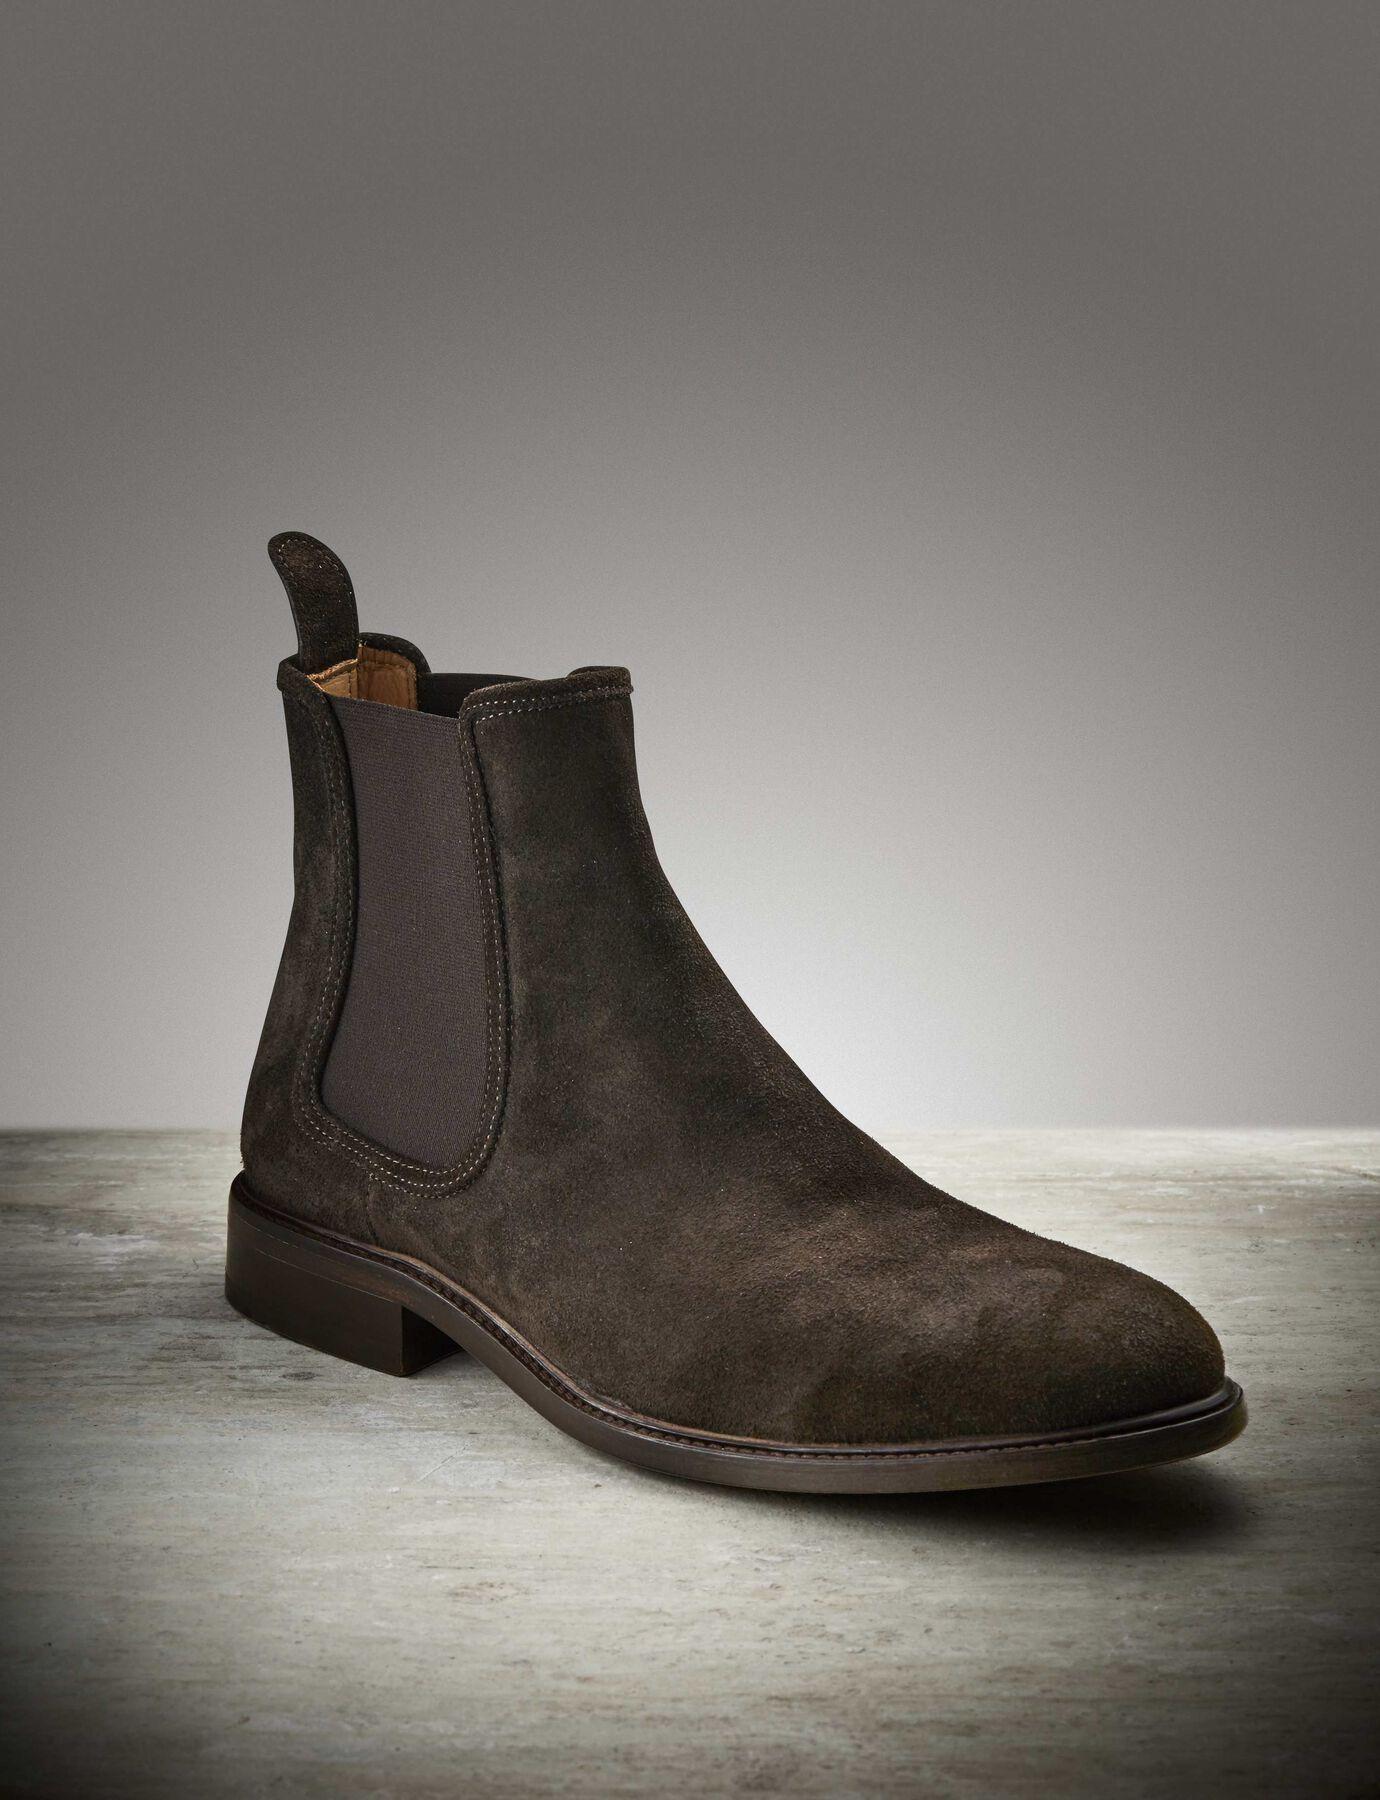 Montan S Boot in Dark Brown Suede from Tiger of Sweden